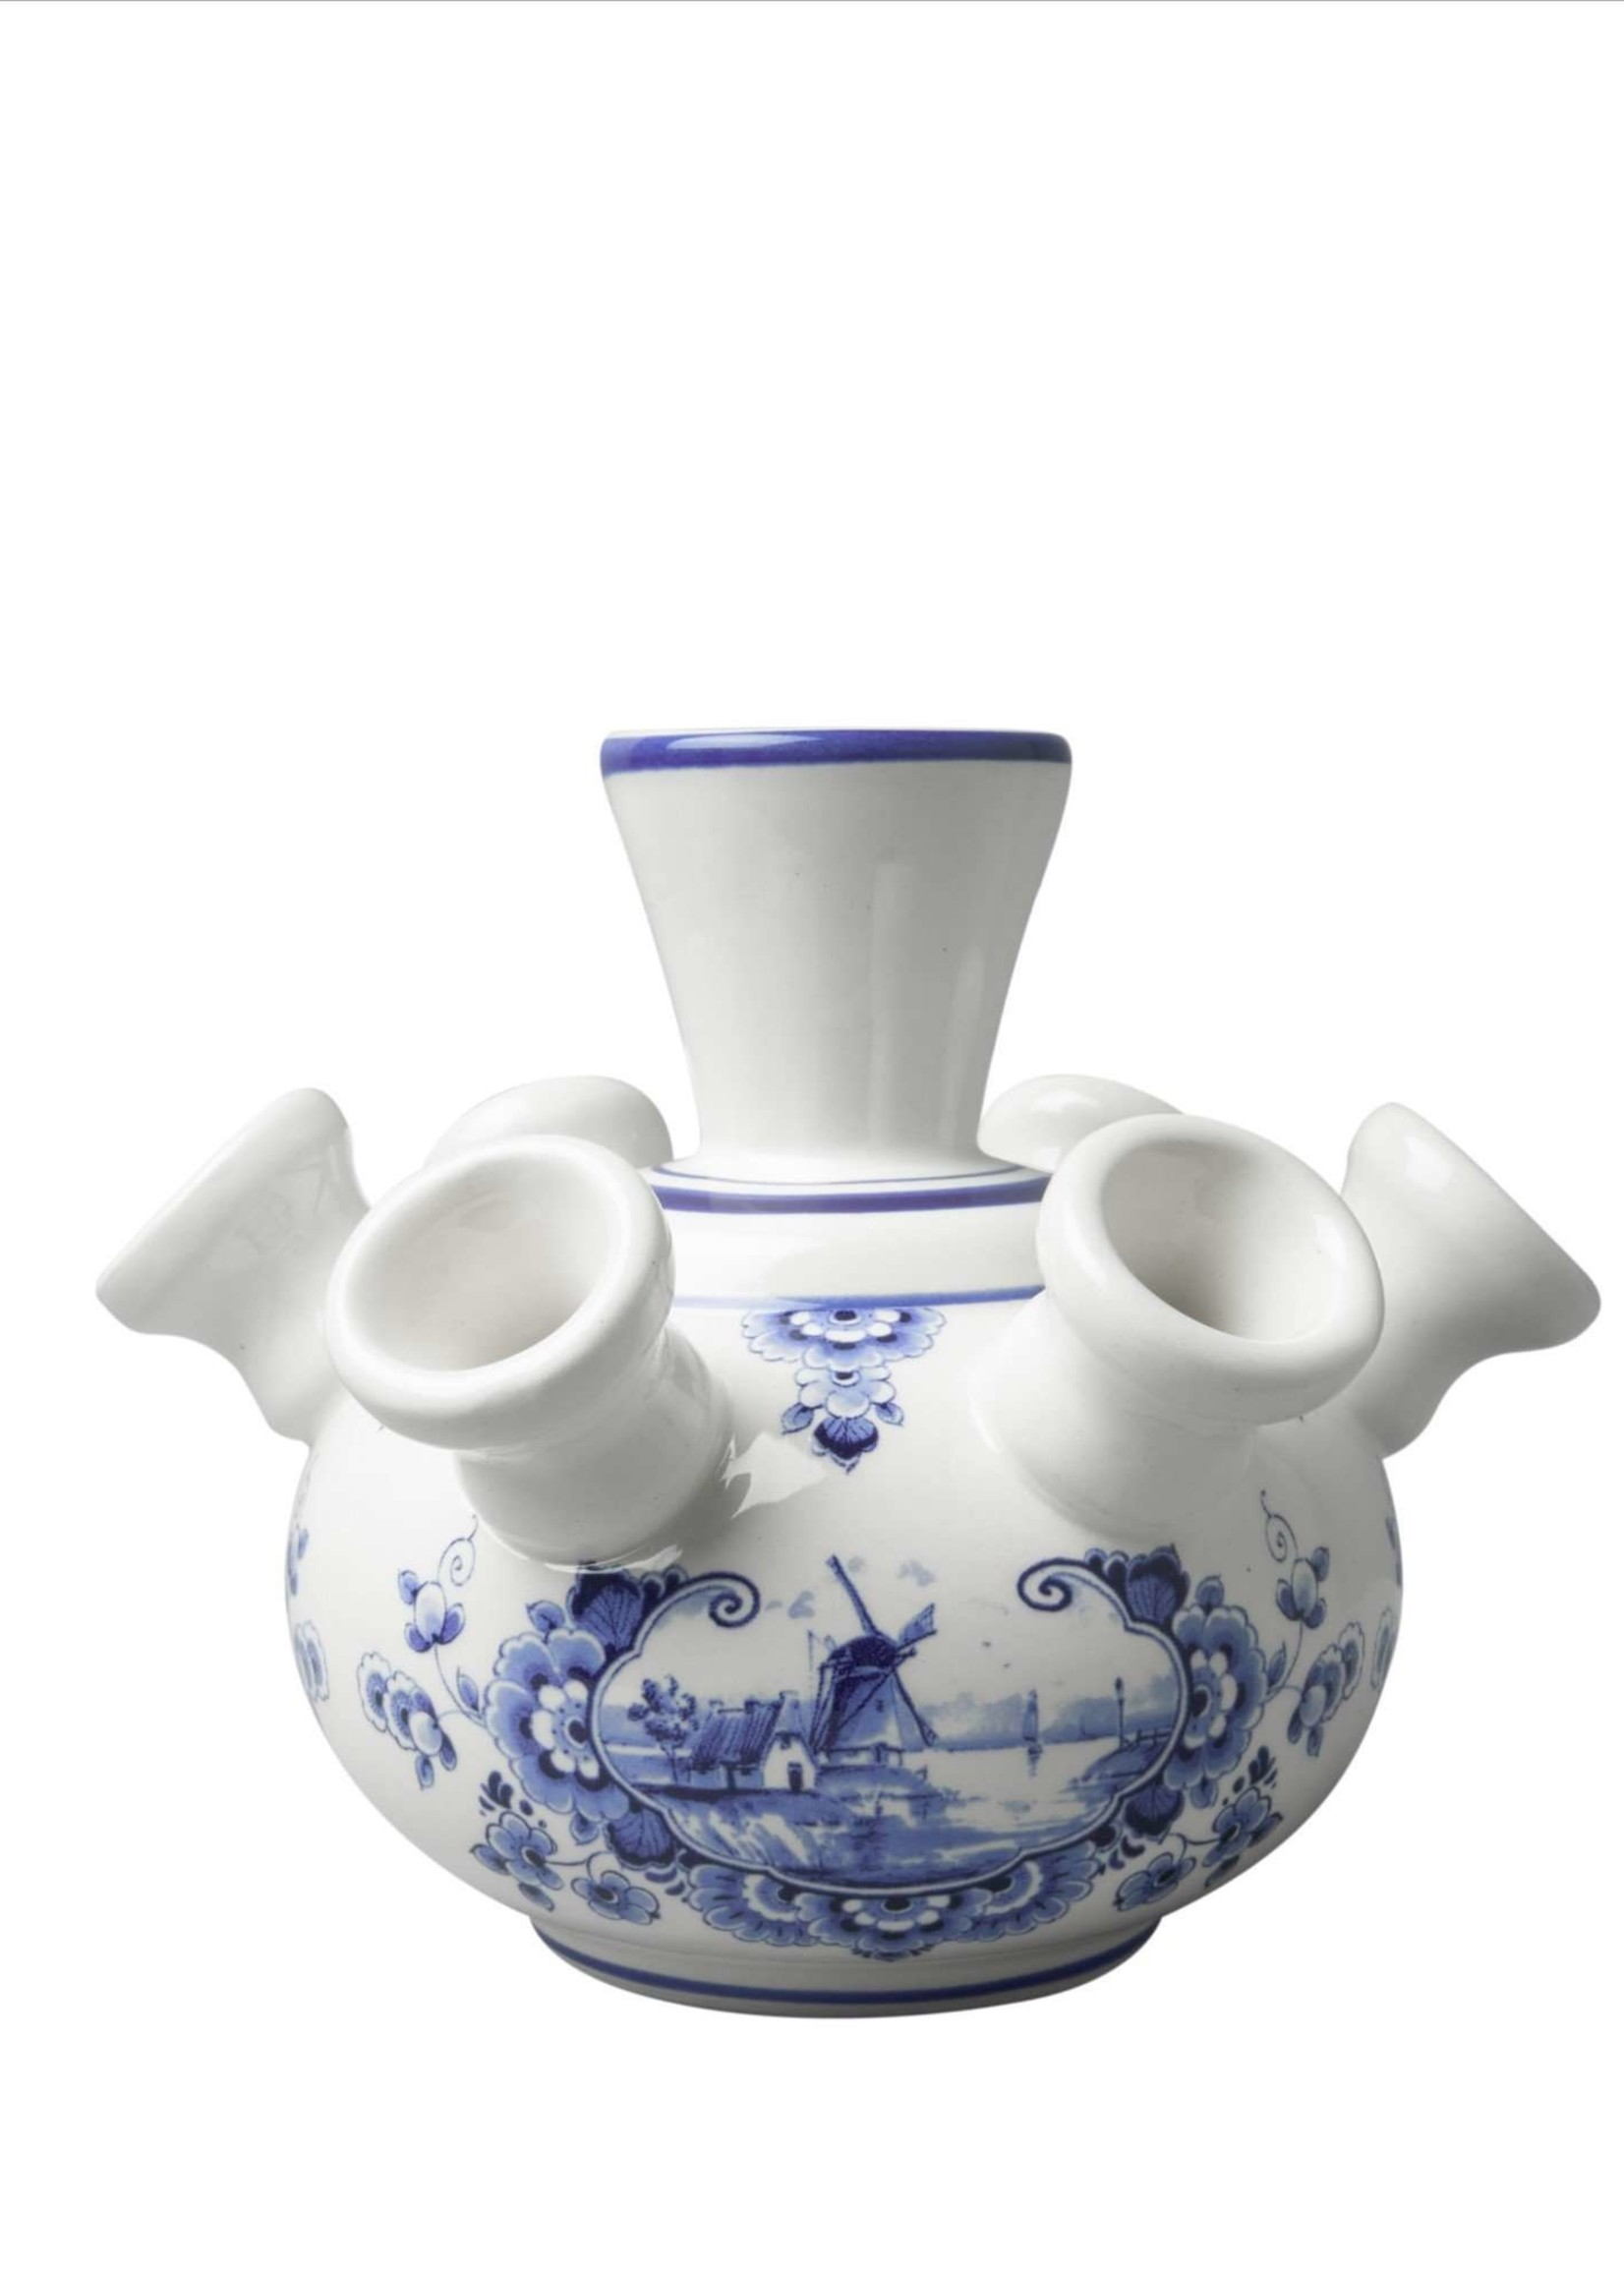 Heinen Delfts Blauw Delft Blue Tulip Vase, Windmill Design, Small